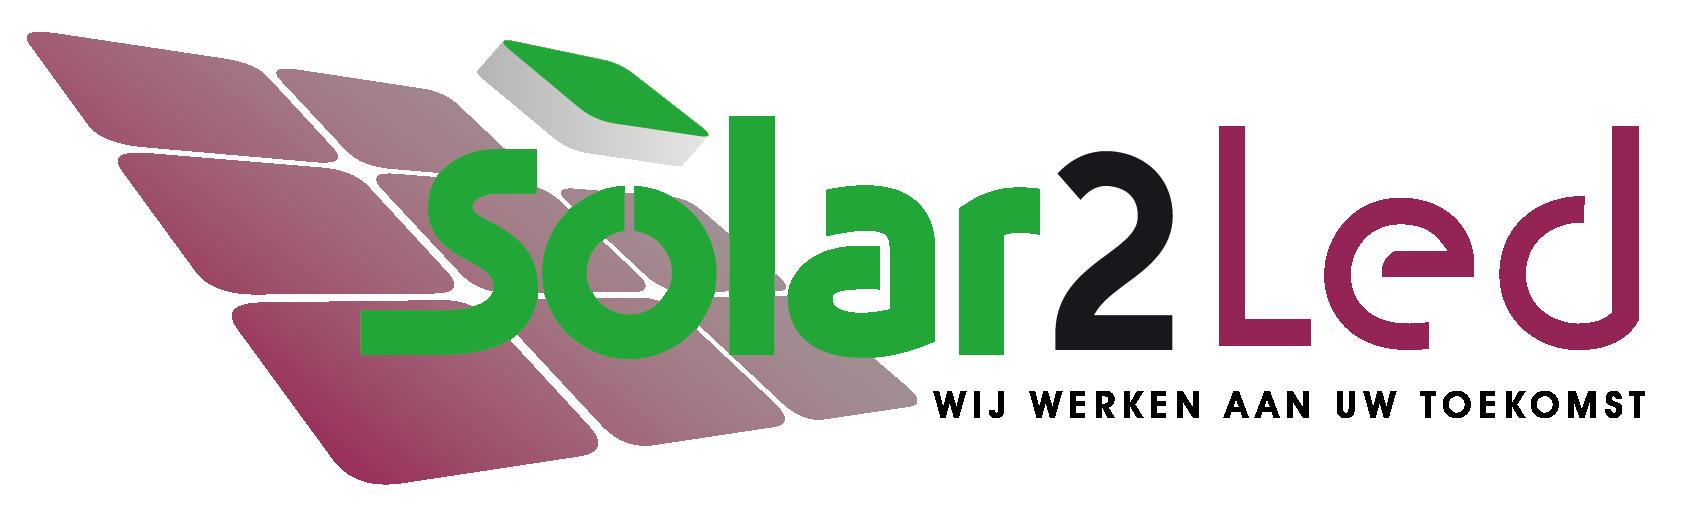 Solar2Led